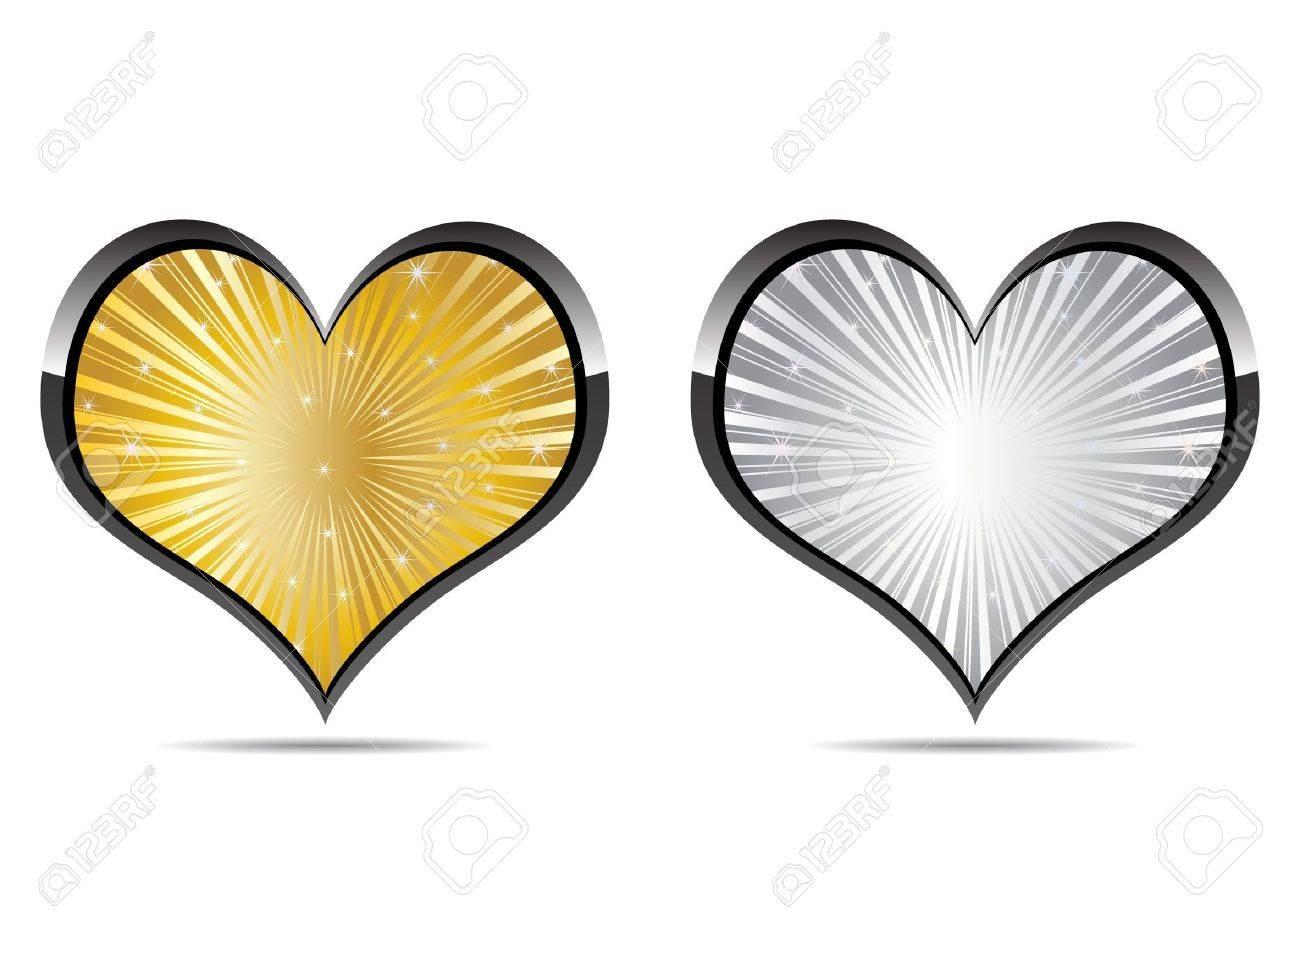 heart golden and silver Stock Vector - 10496894